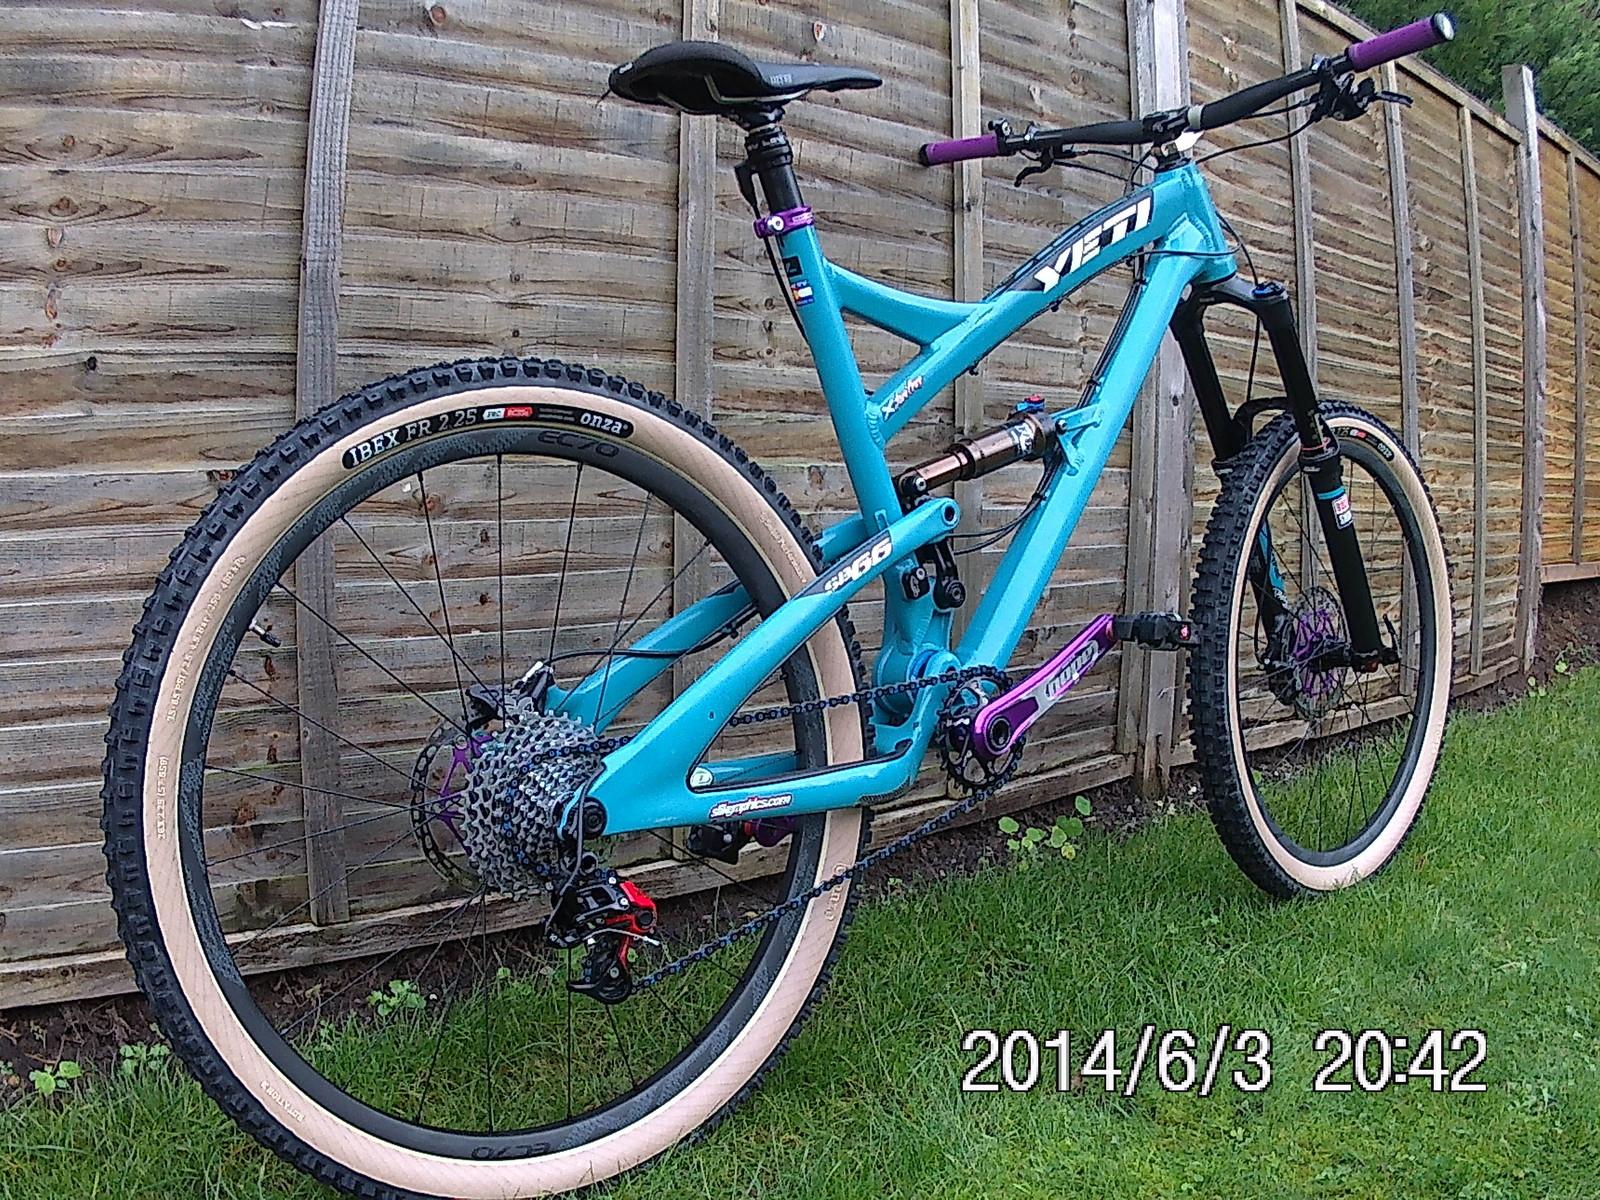 20140603 204249 - Bítel - Mountain Biking Pictures - Vital MTB